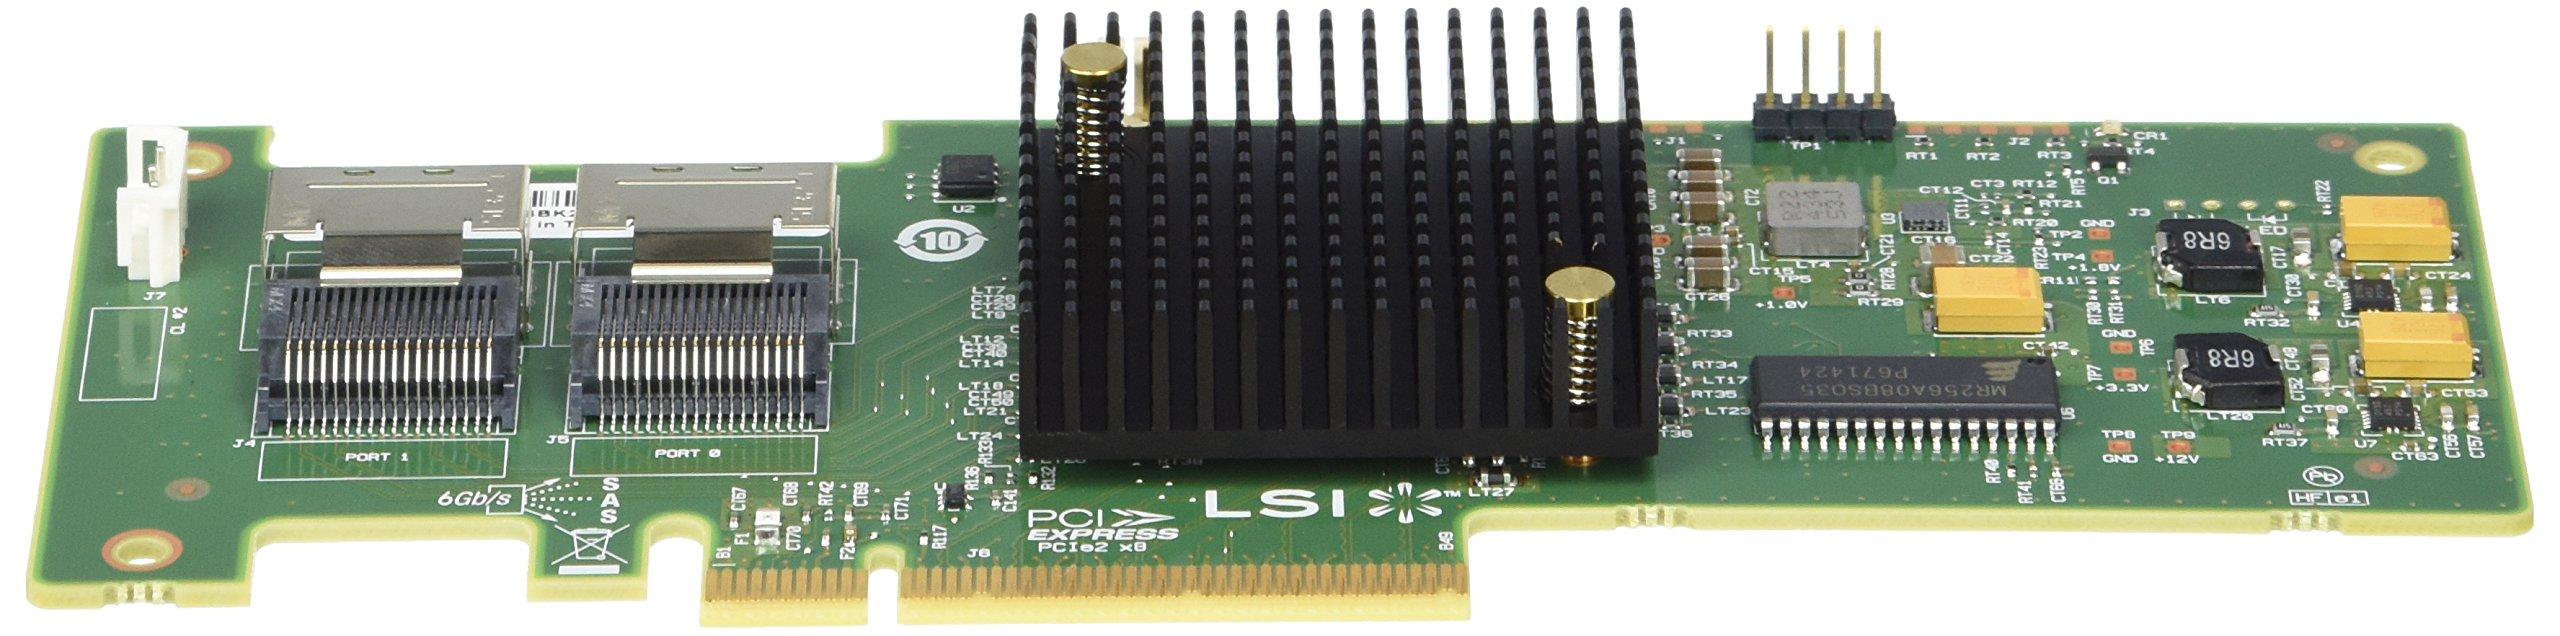 IBM Serveraid M1115 SAS/SATA Controller for System X (81Y4448)